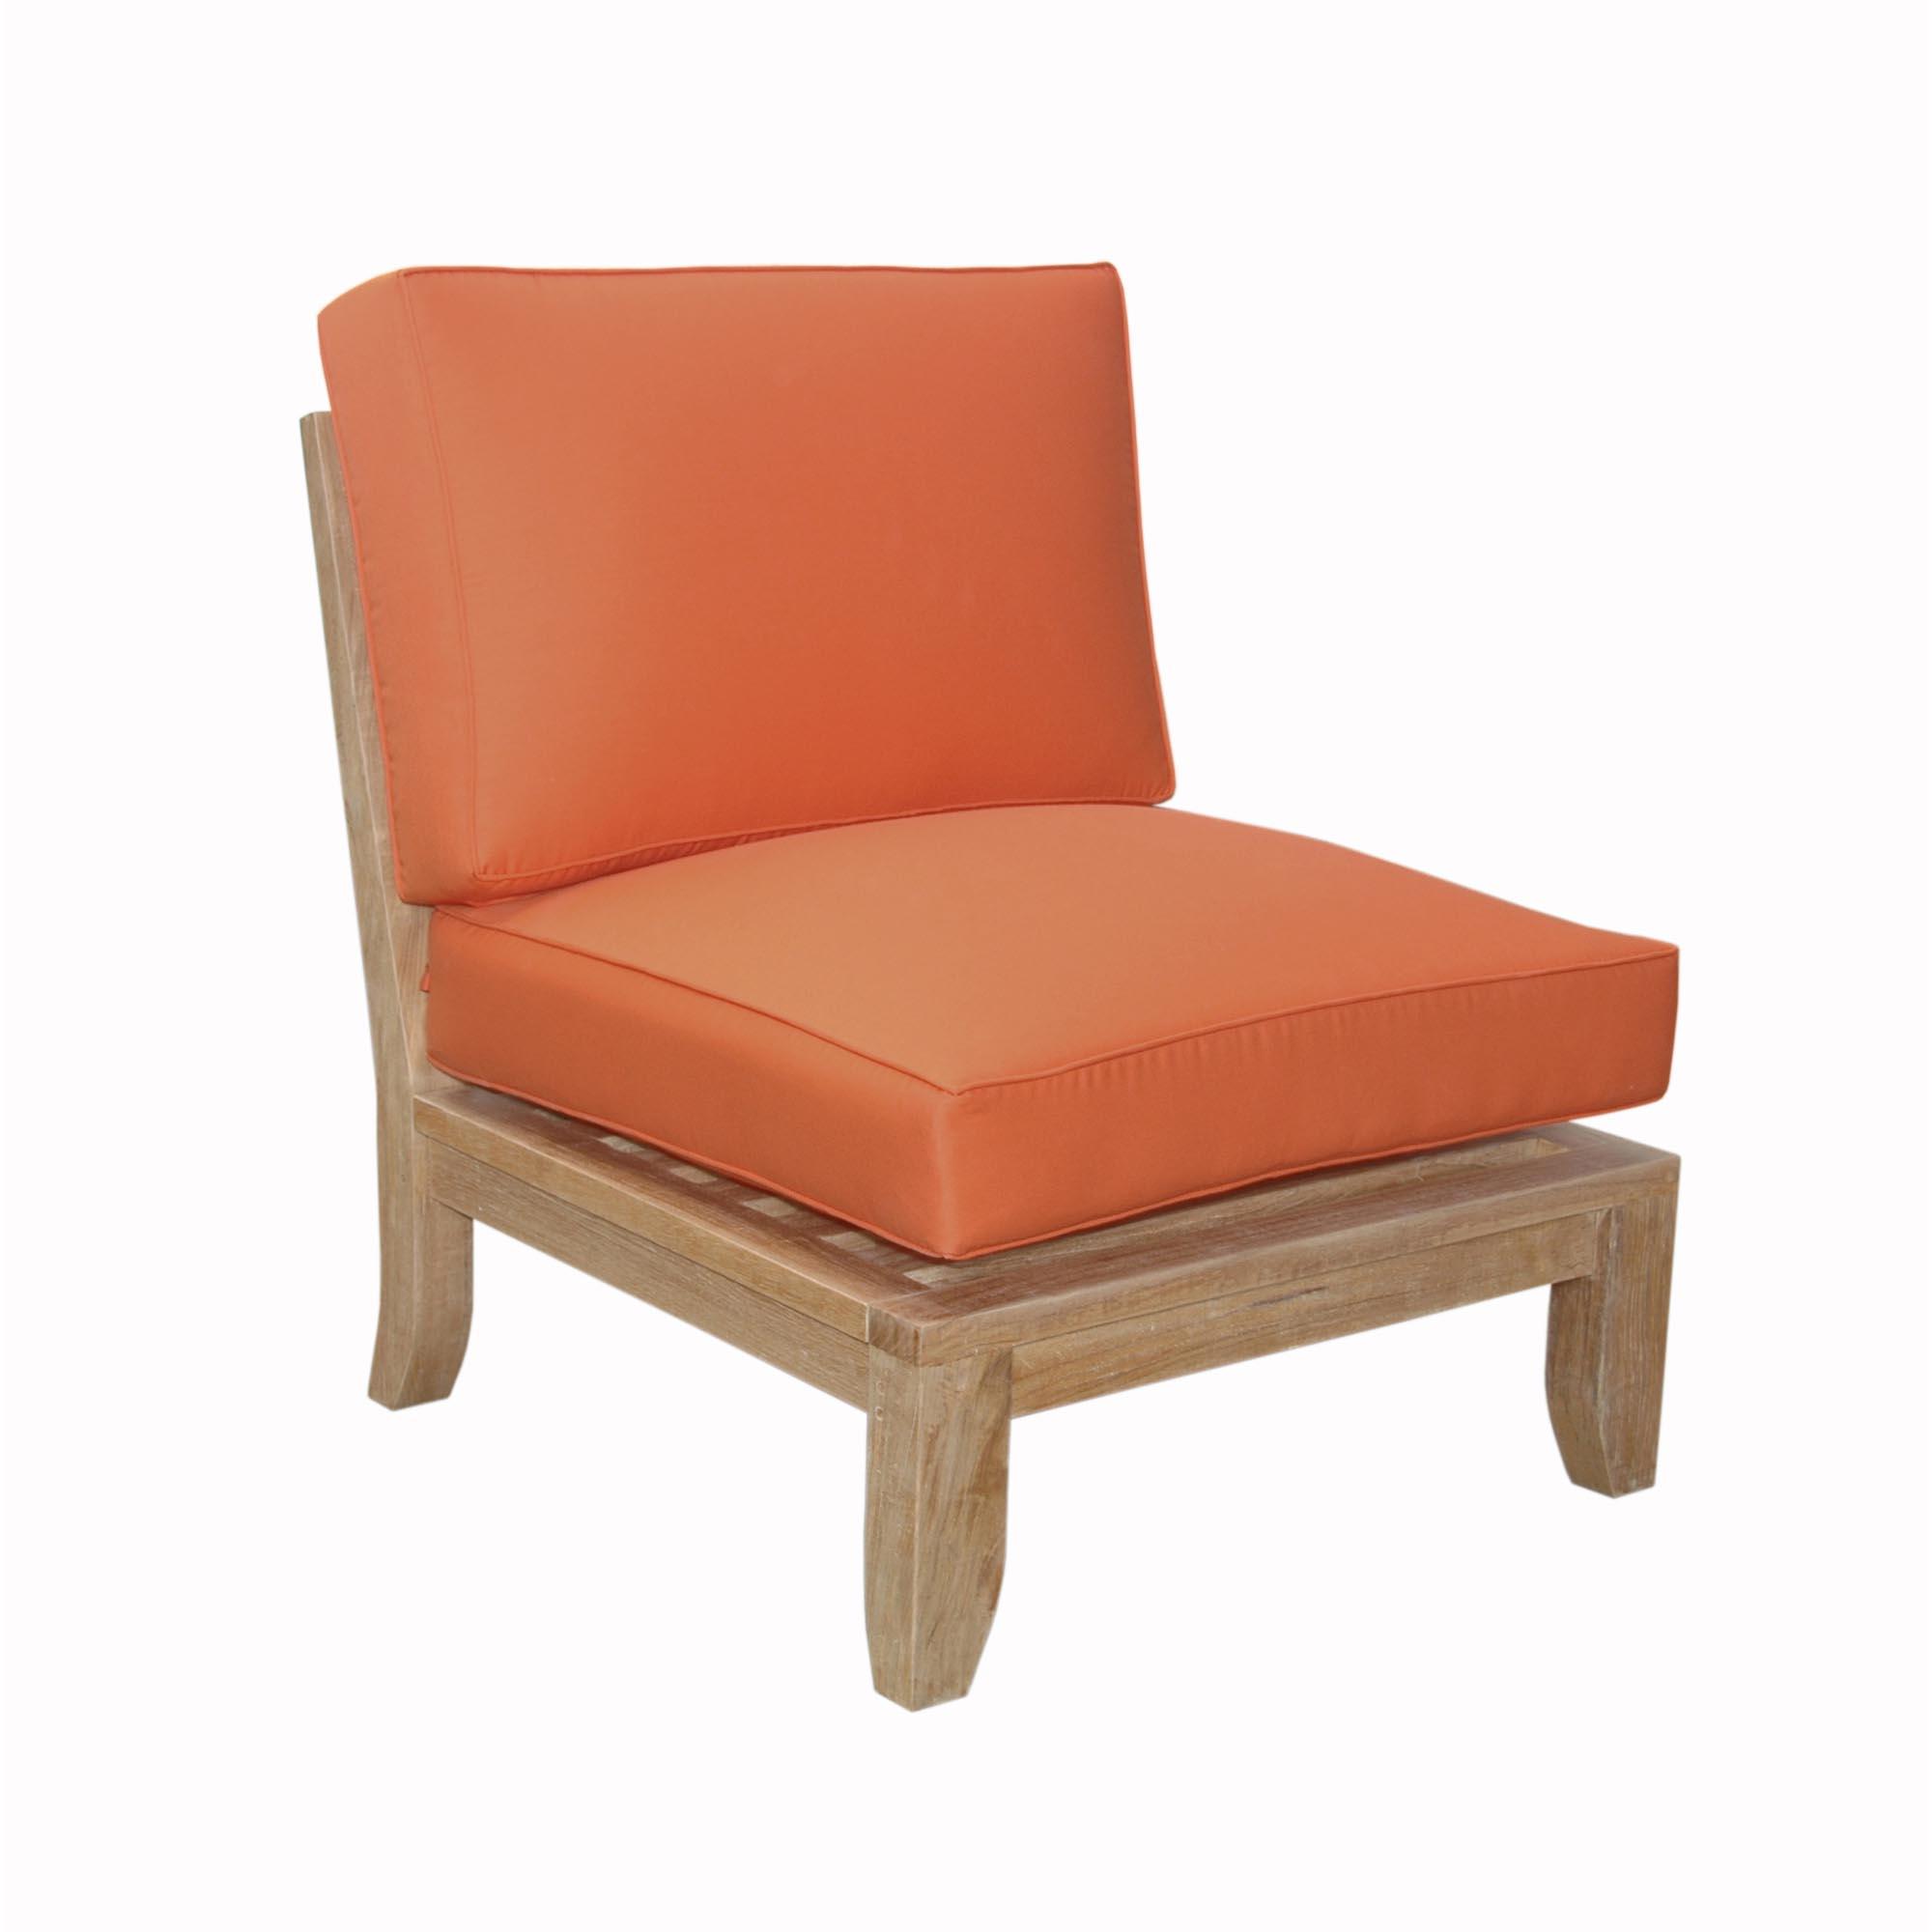 Splendid Teak Luxe Center Modular Sofa Product Photo